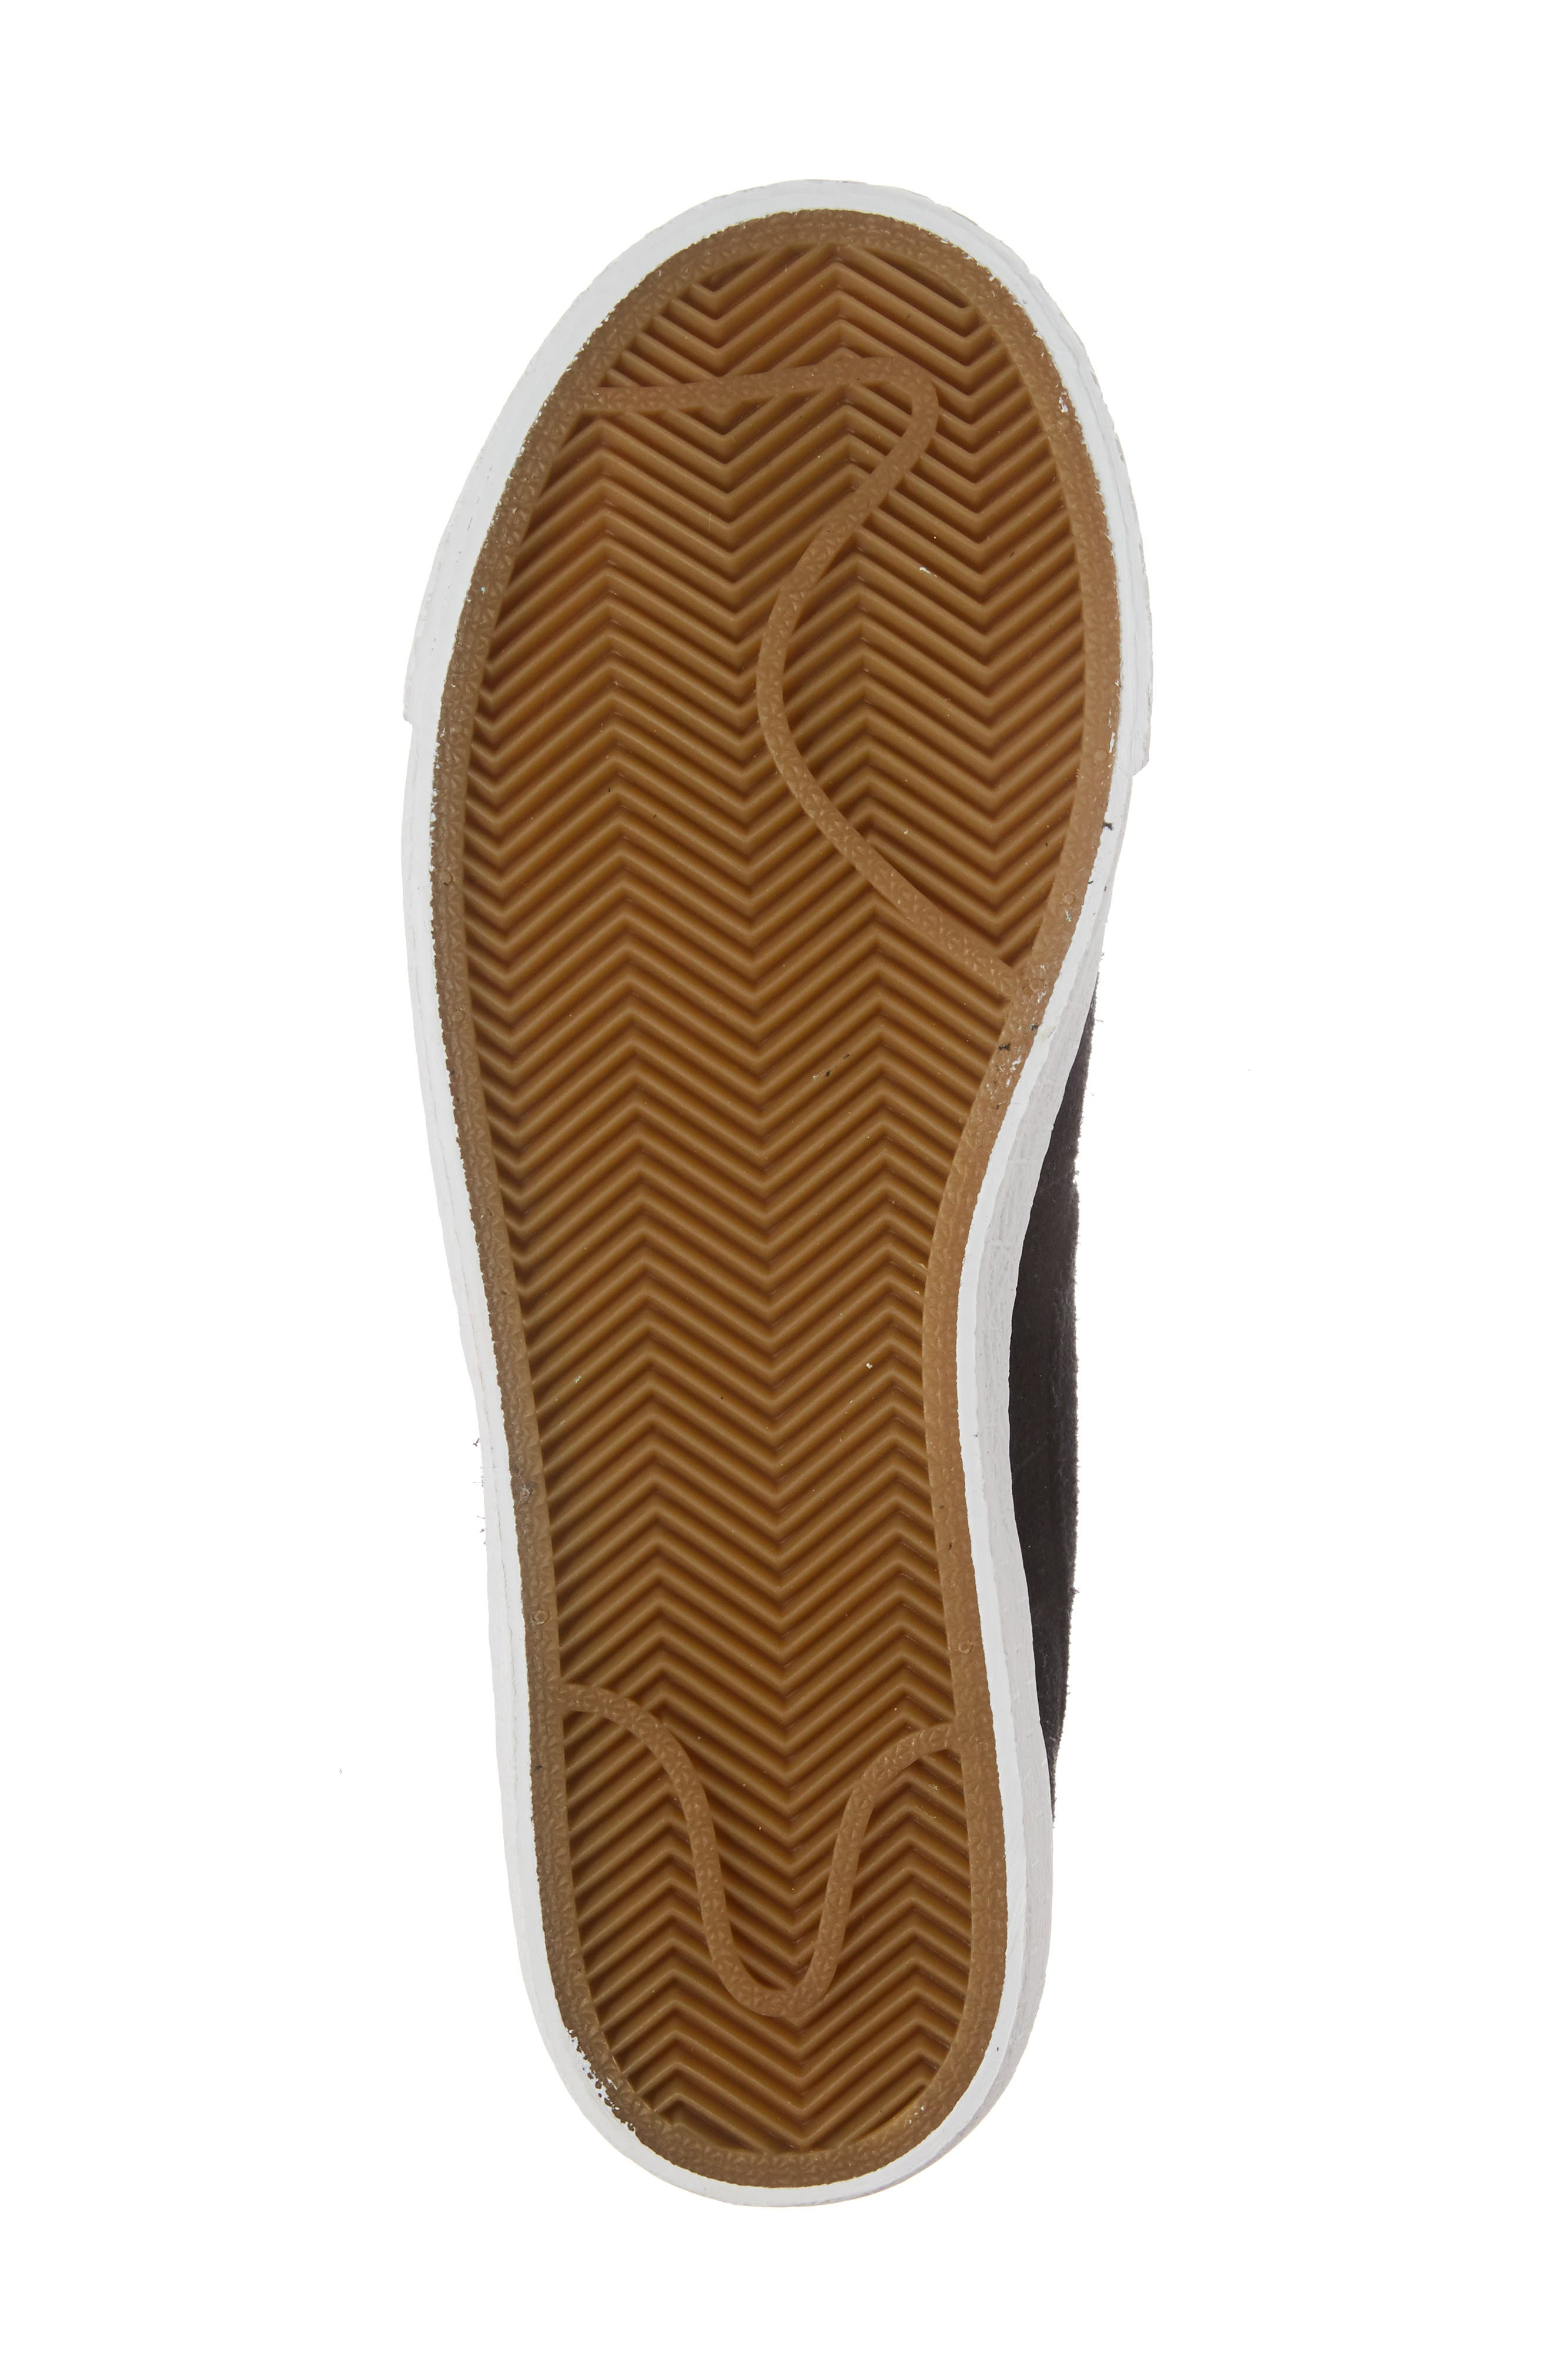 Blazer Mid High Top Sneaker,                             Alternate thumbnail 6, color,                             003